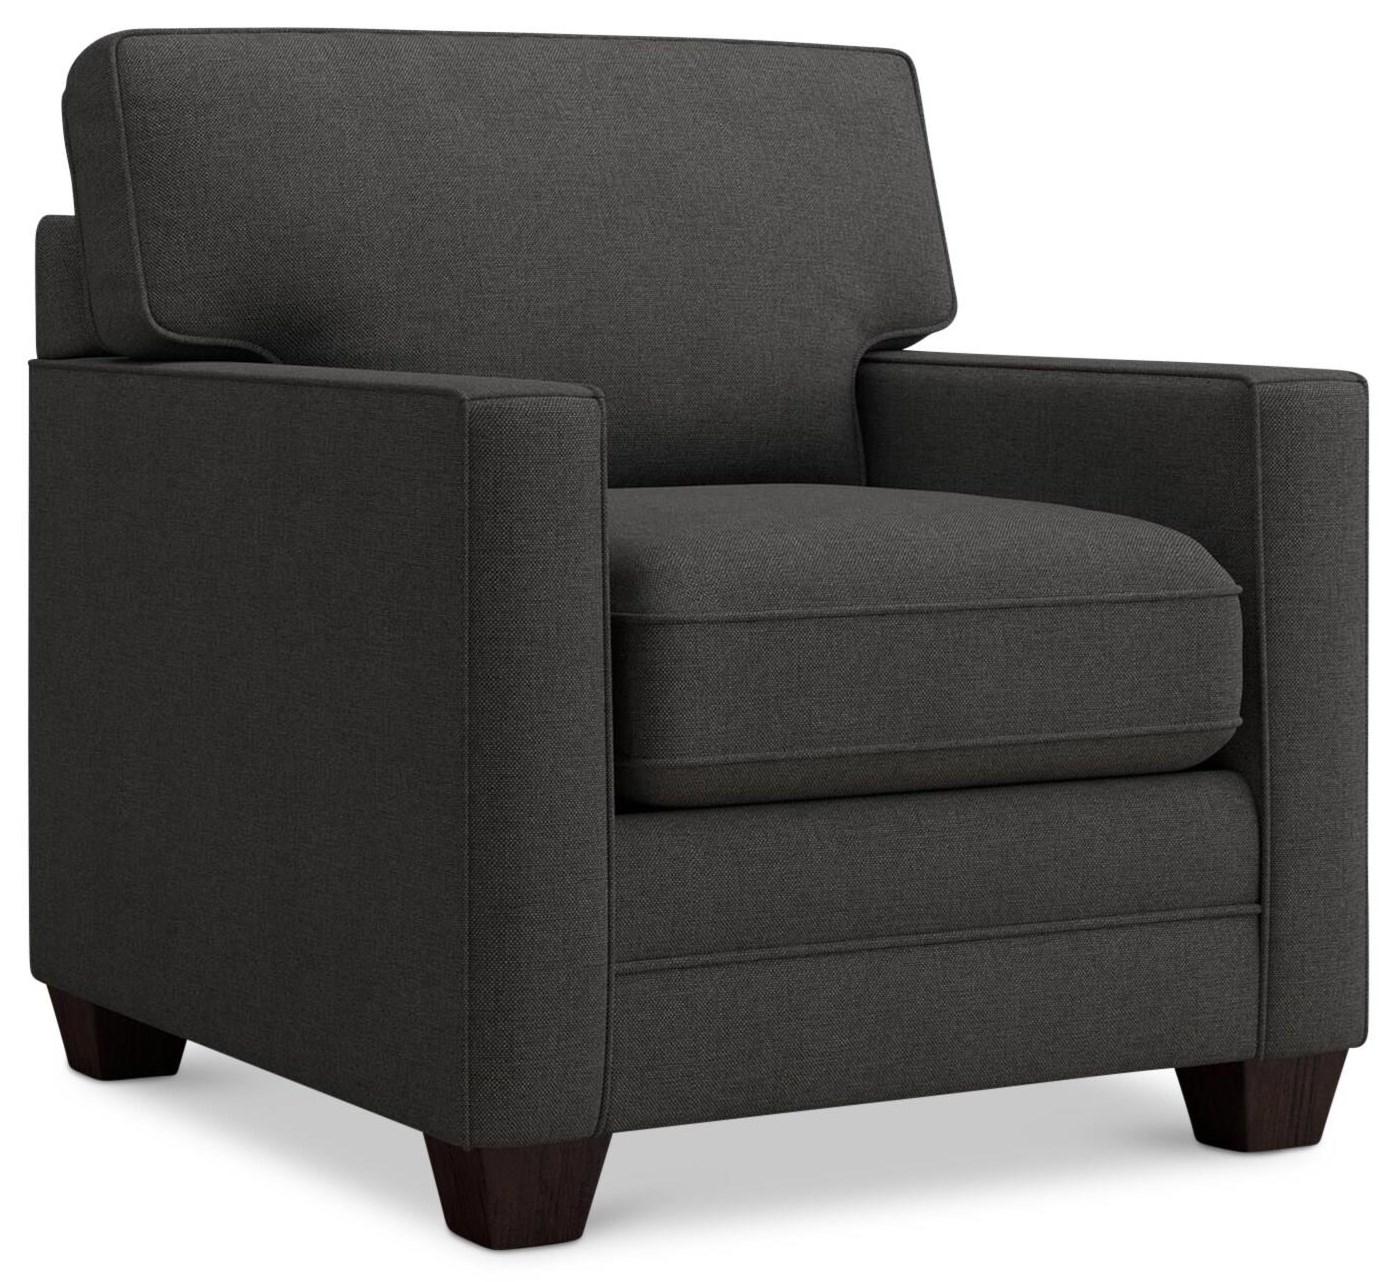 Alexander Chair by Bassett at Crowley Furniture & Mattress